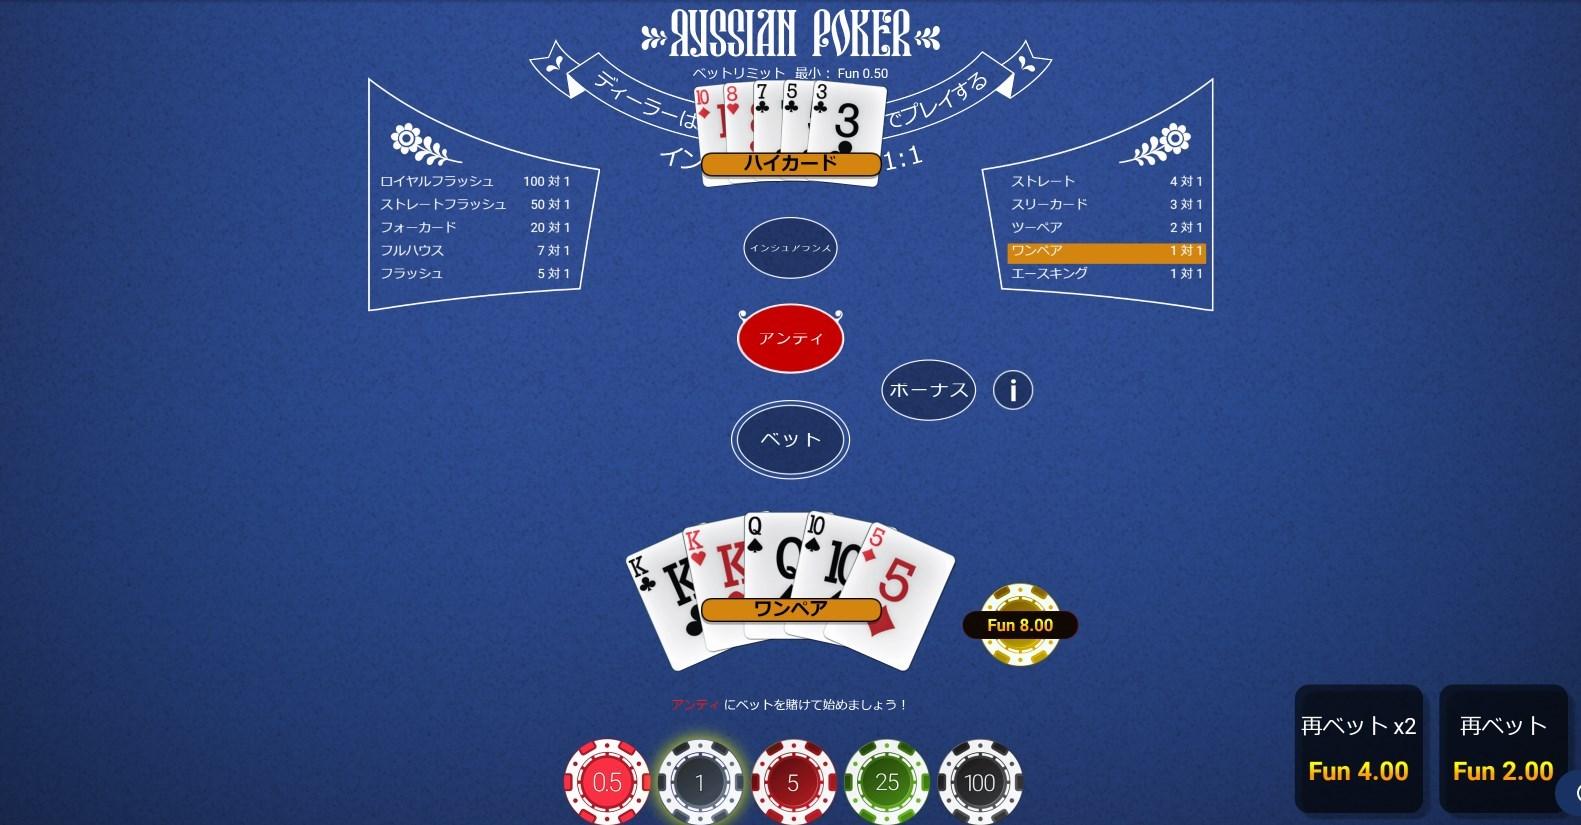 Russian Poker(ロシアポーカー)